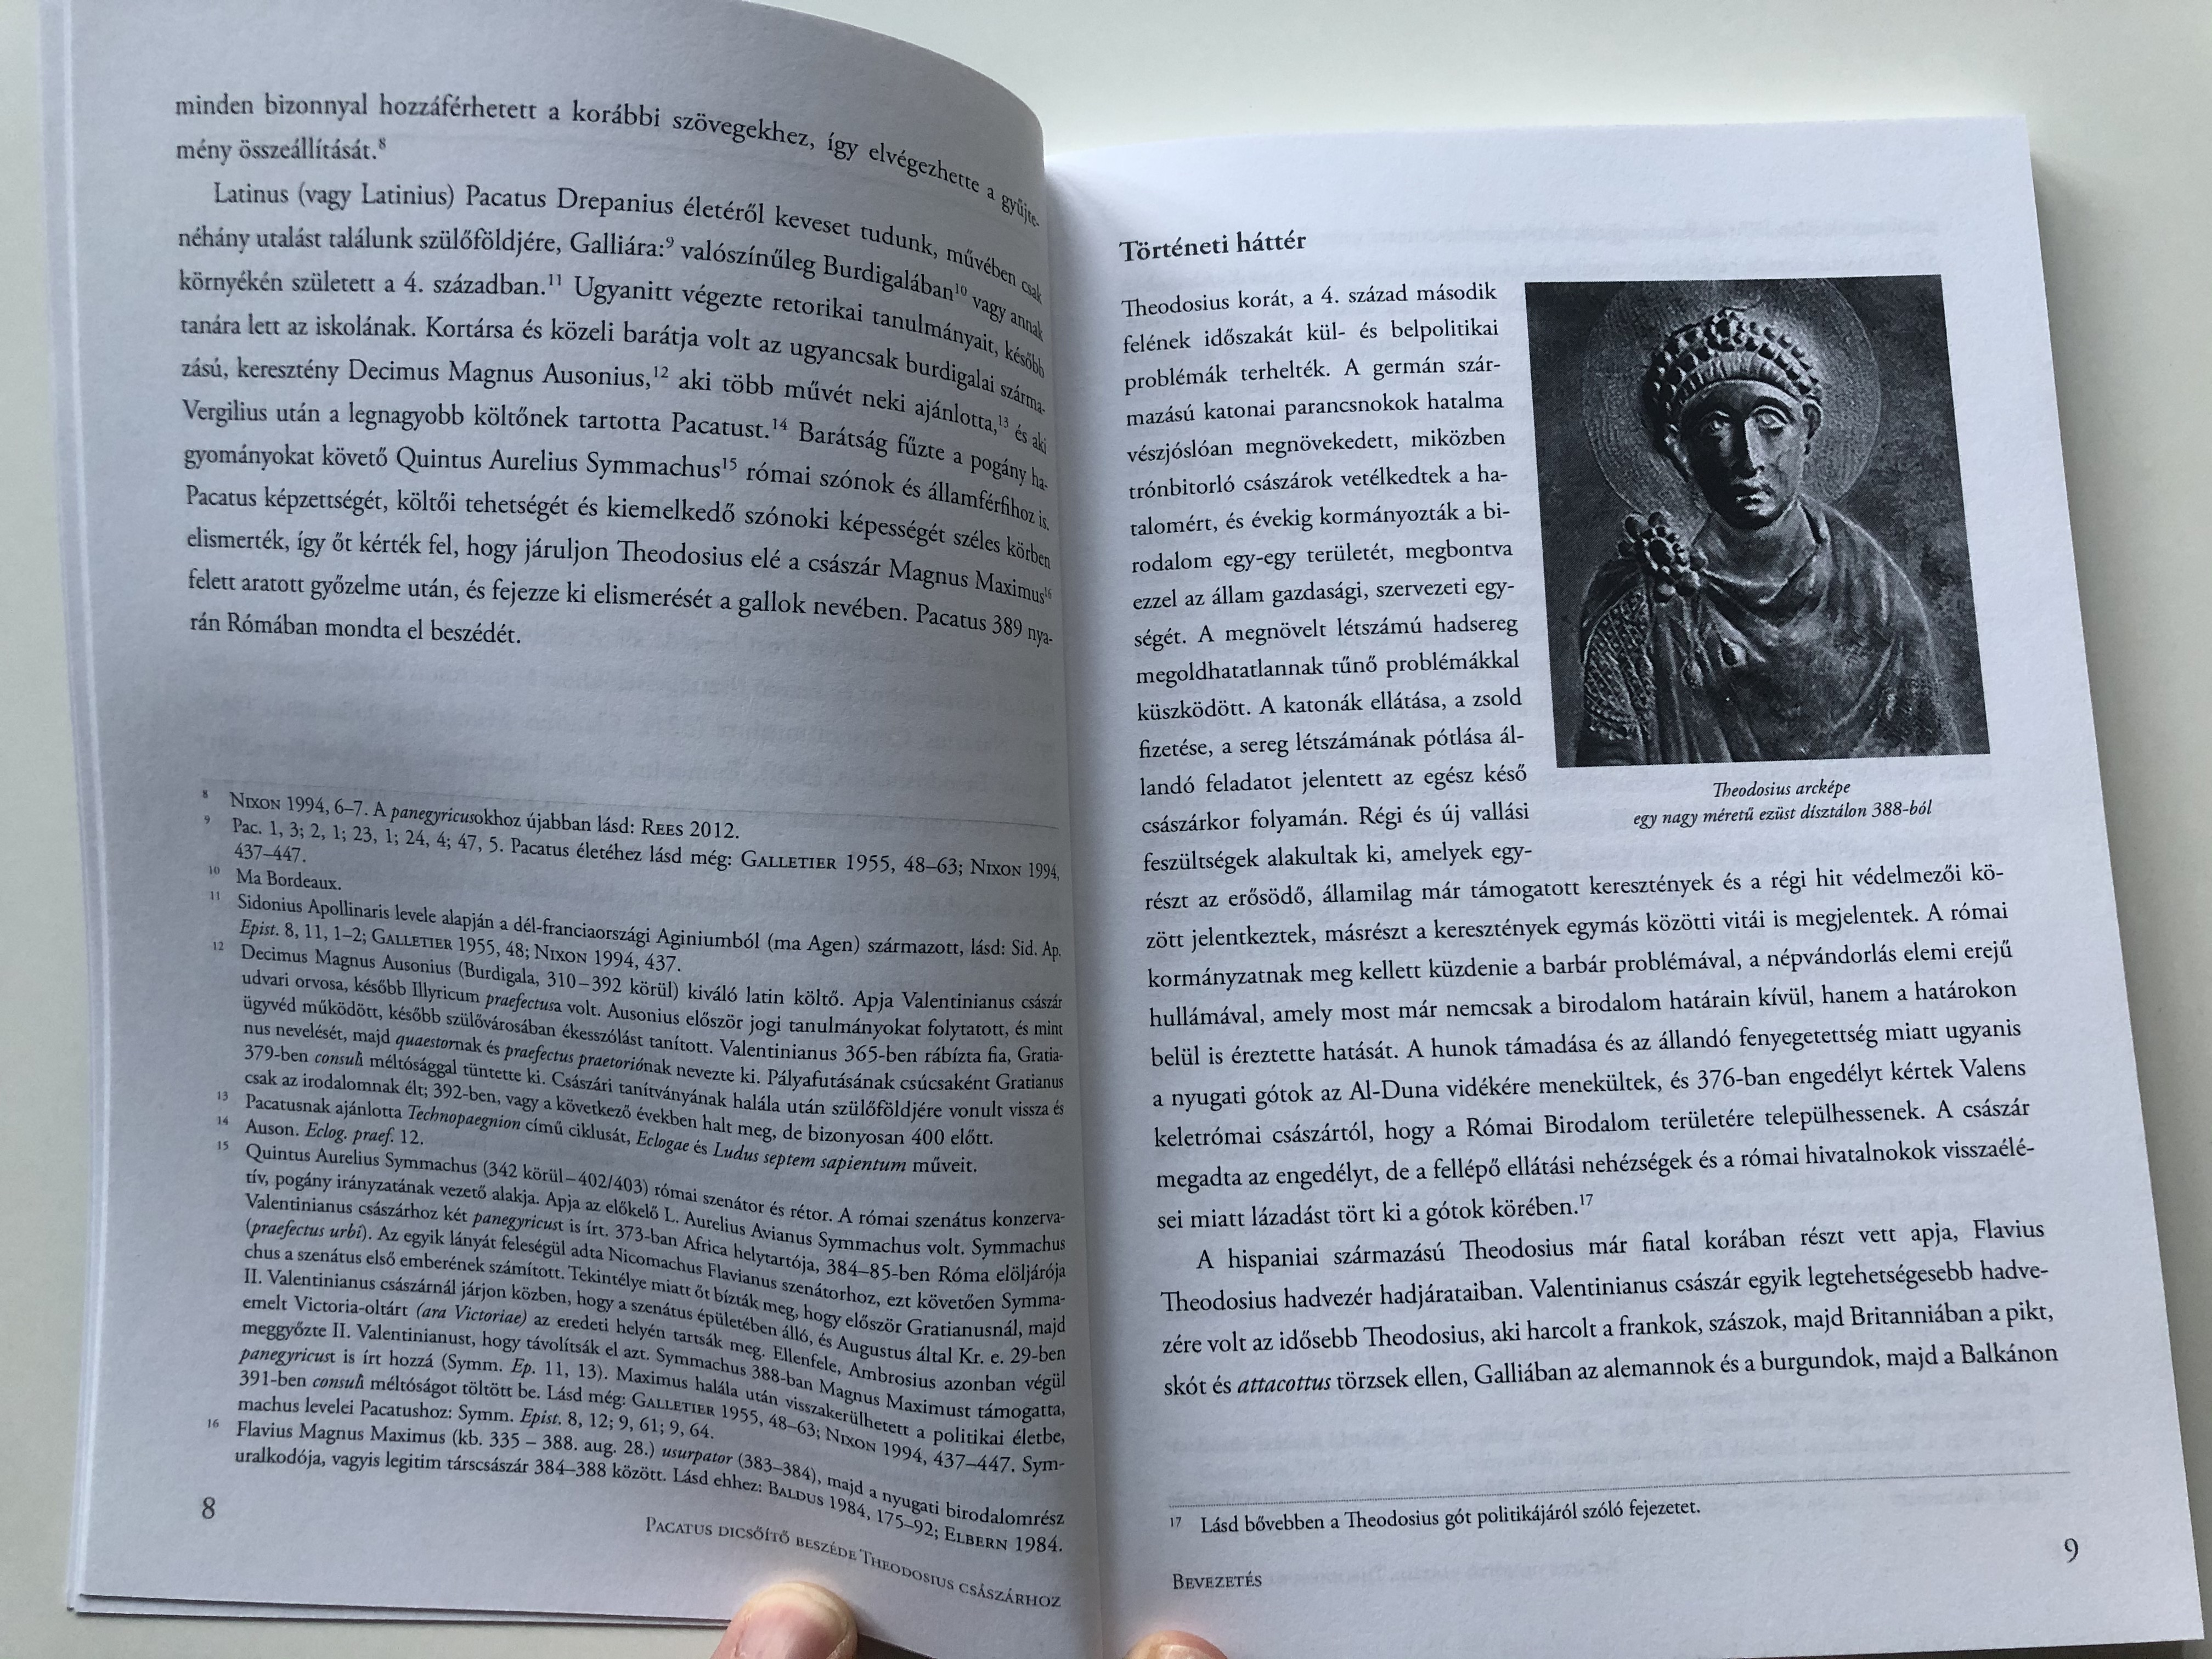 pacatus-dics-t-besz-de-theodosius-cs-sz-rhoz-by-sz-kely-melinda-5.jpg